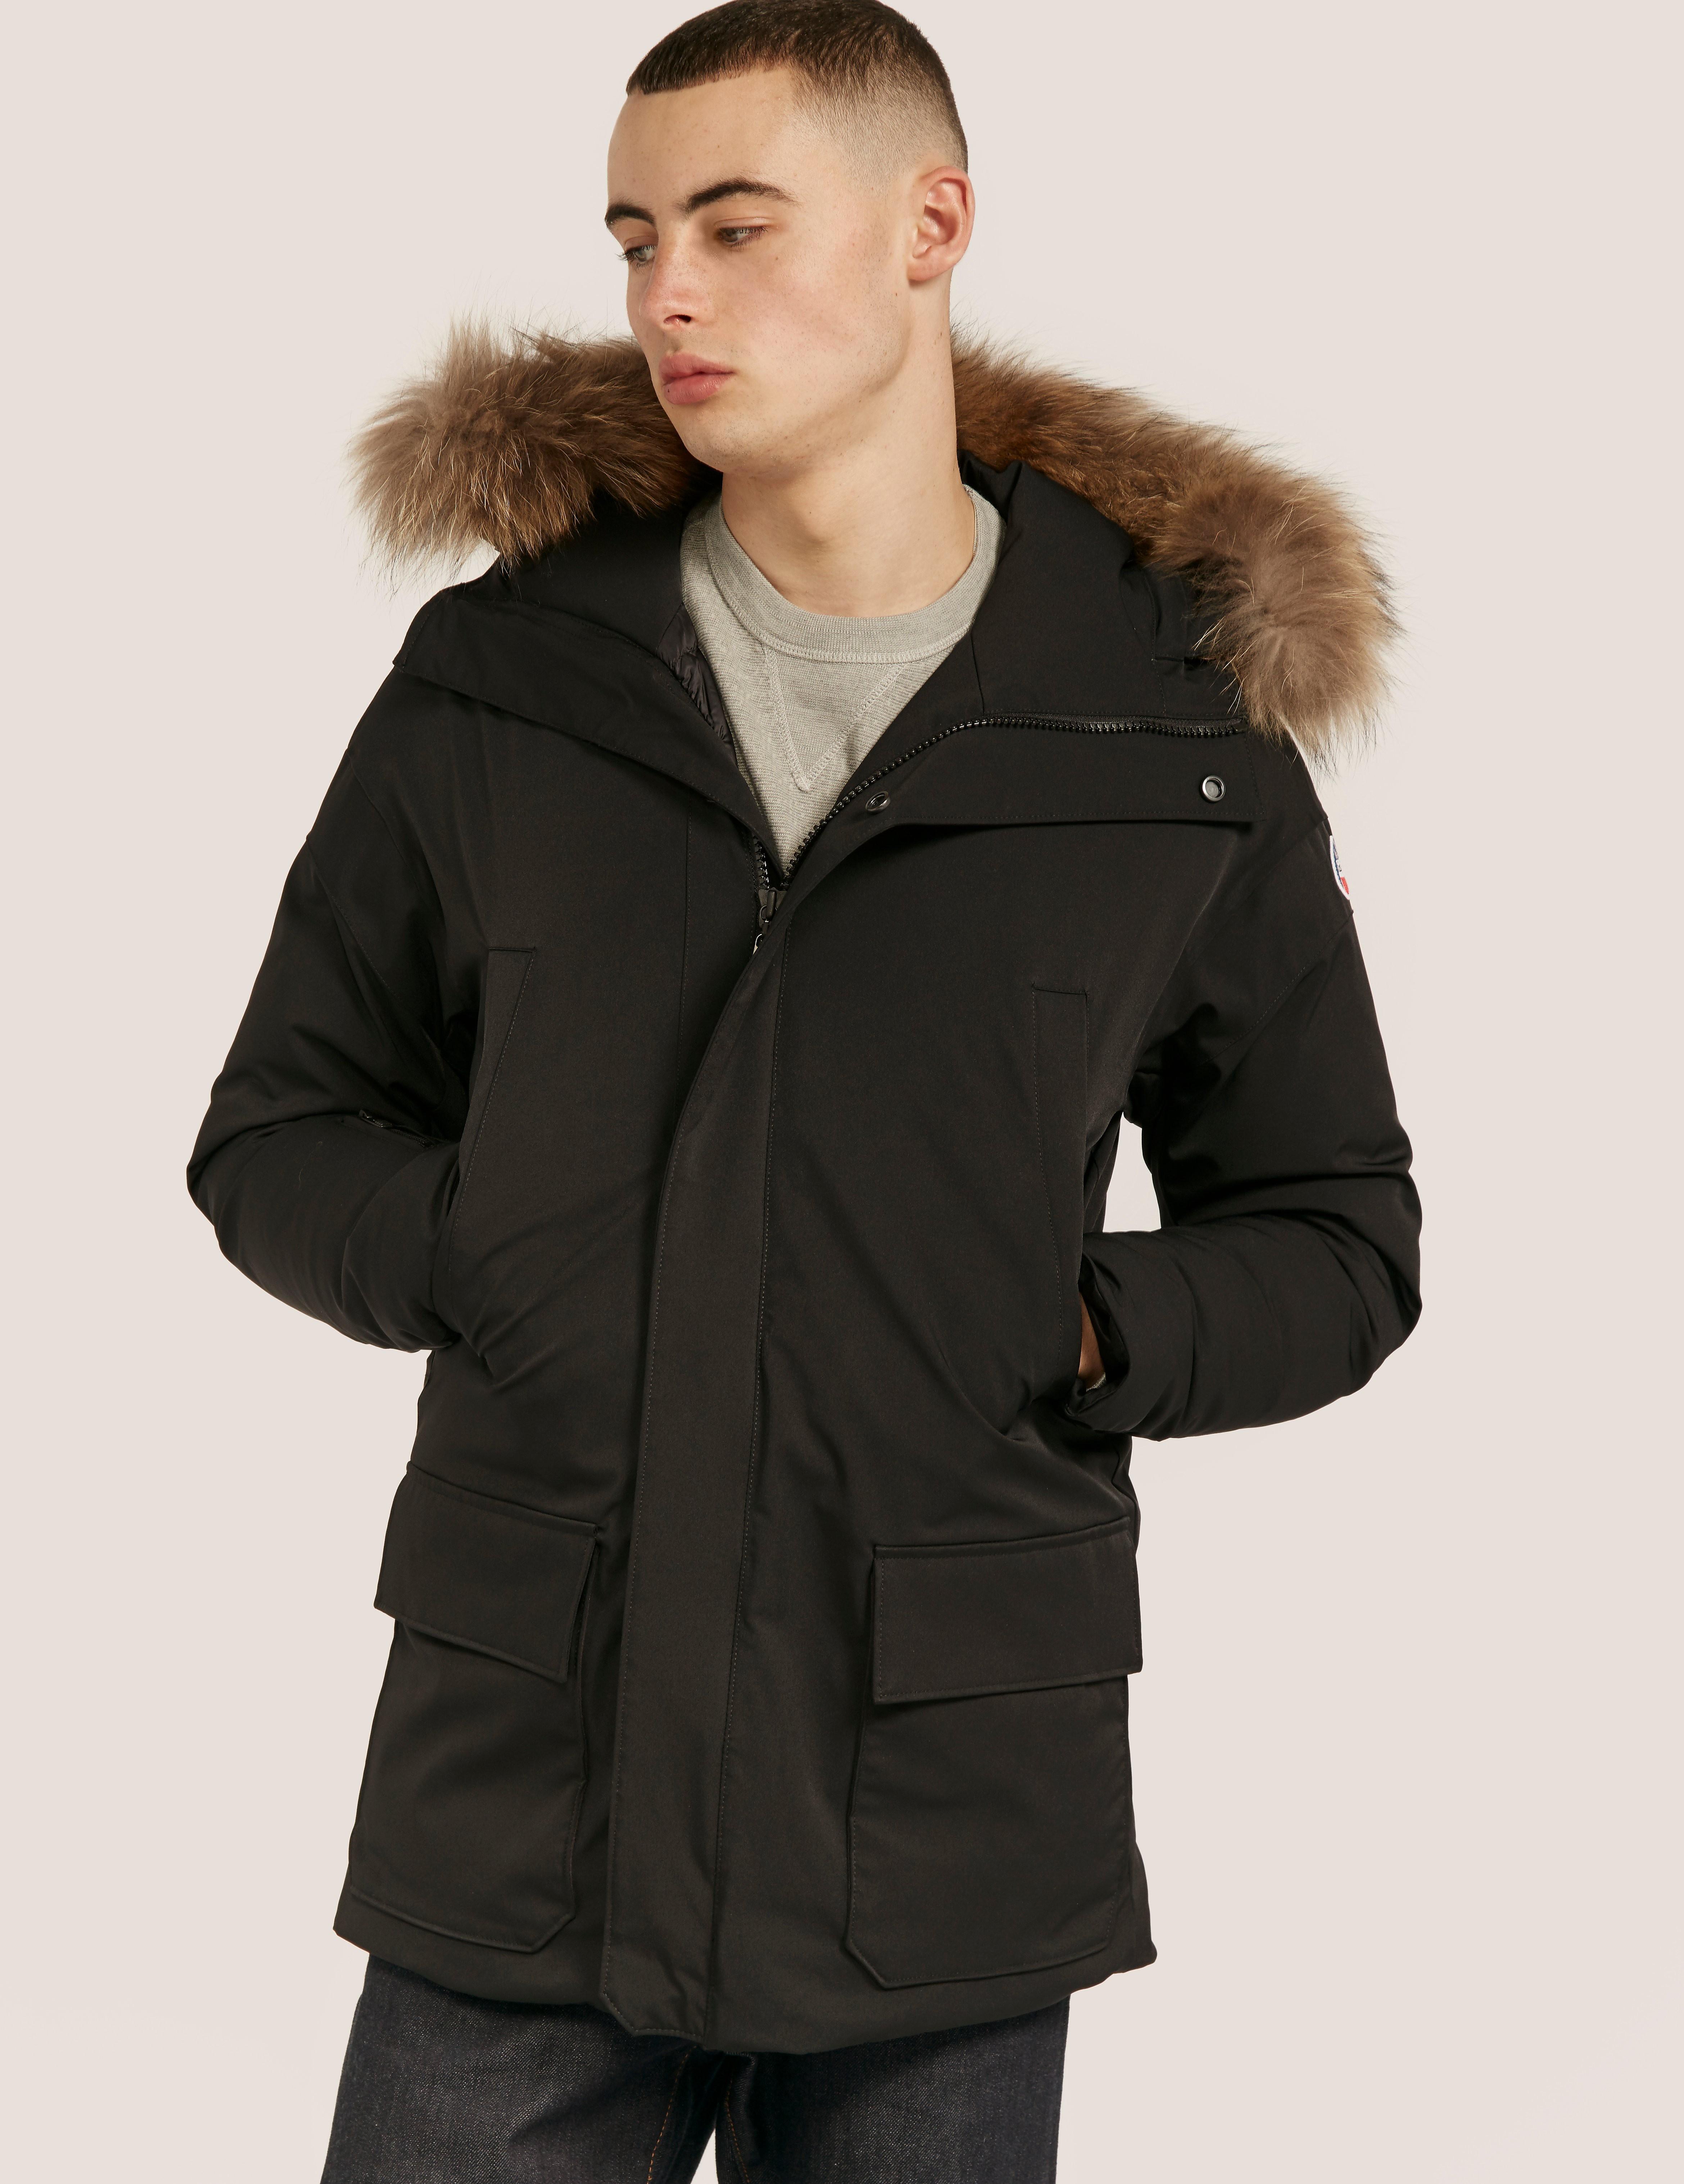 Fusalp Parka Jacket